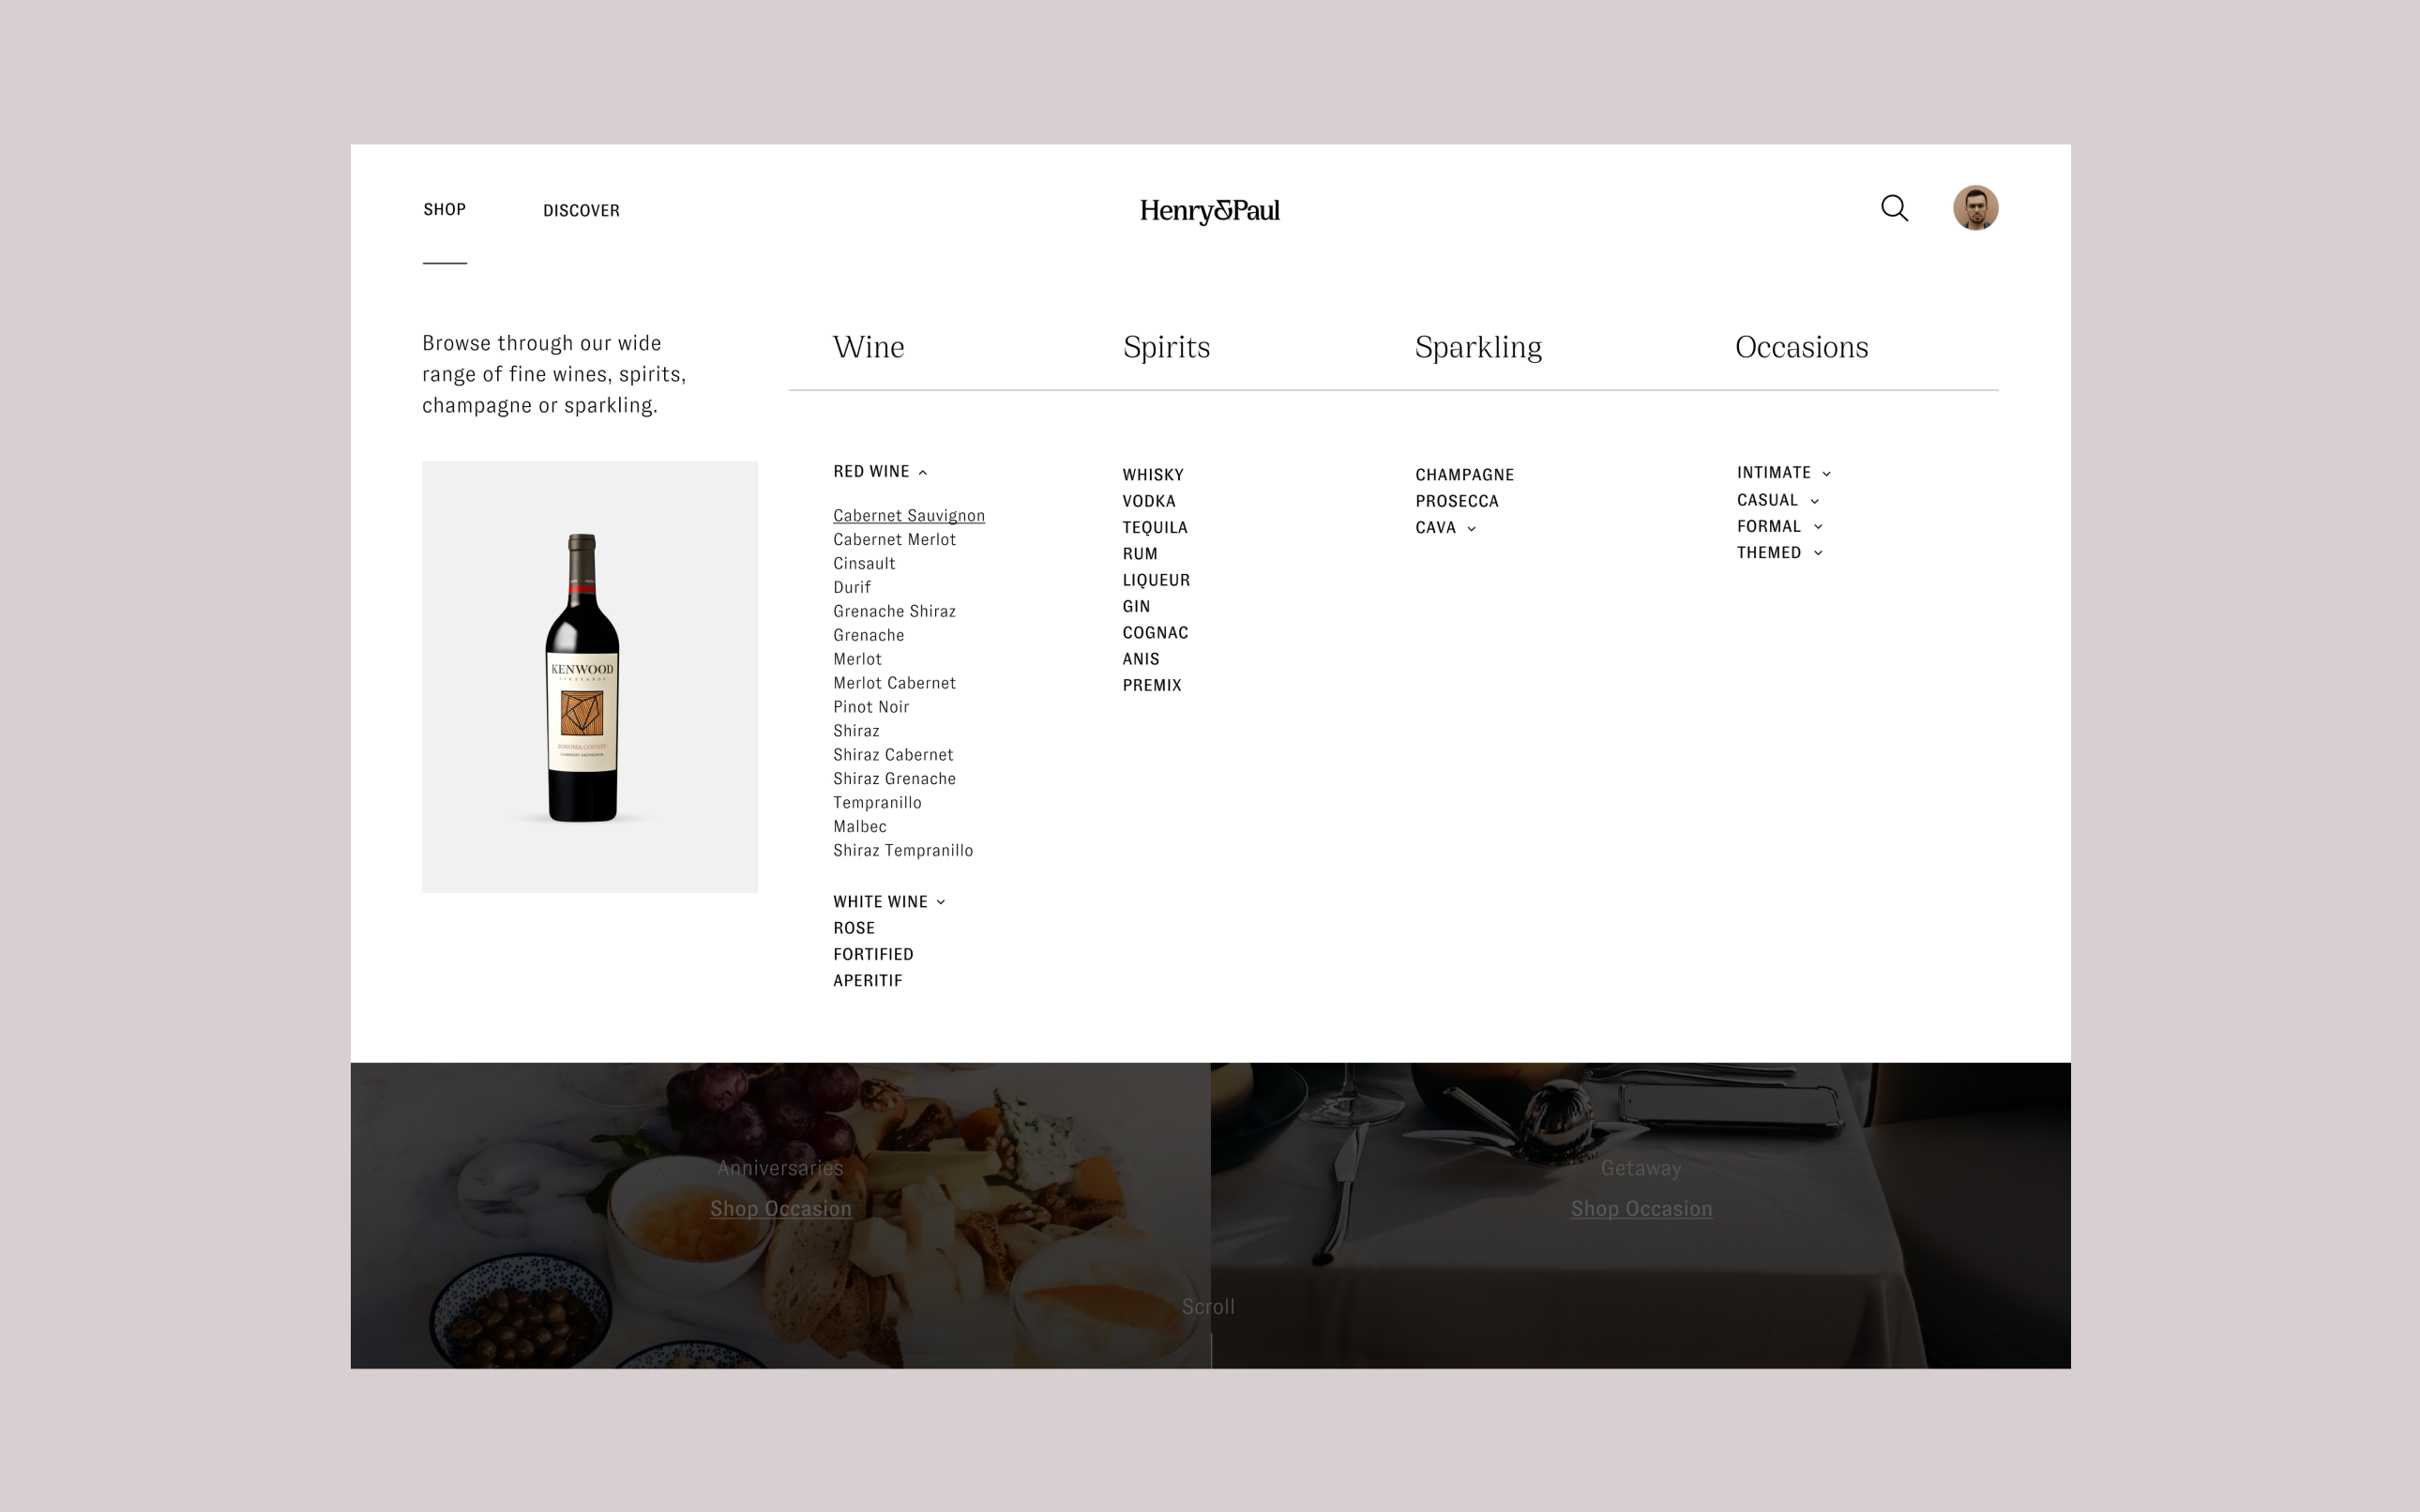 Henry & Paul desktop website, showcasing the drop down menu of all products